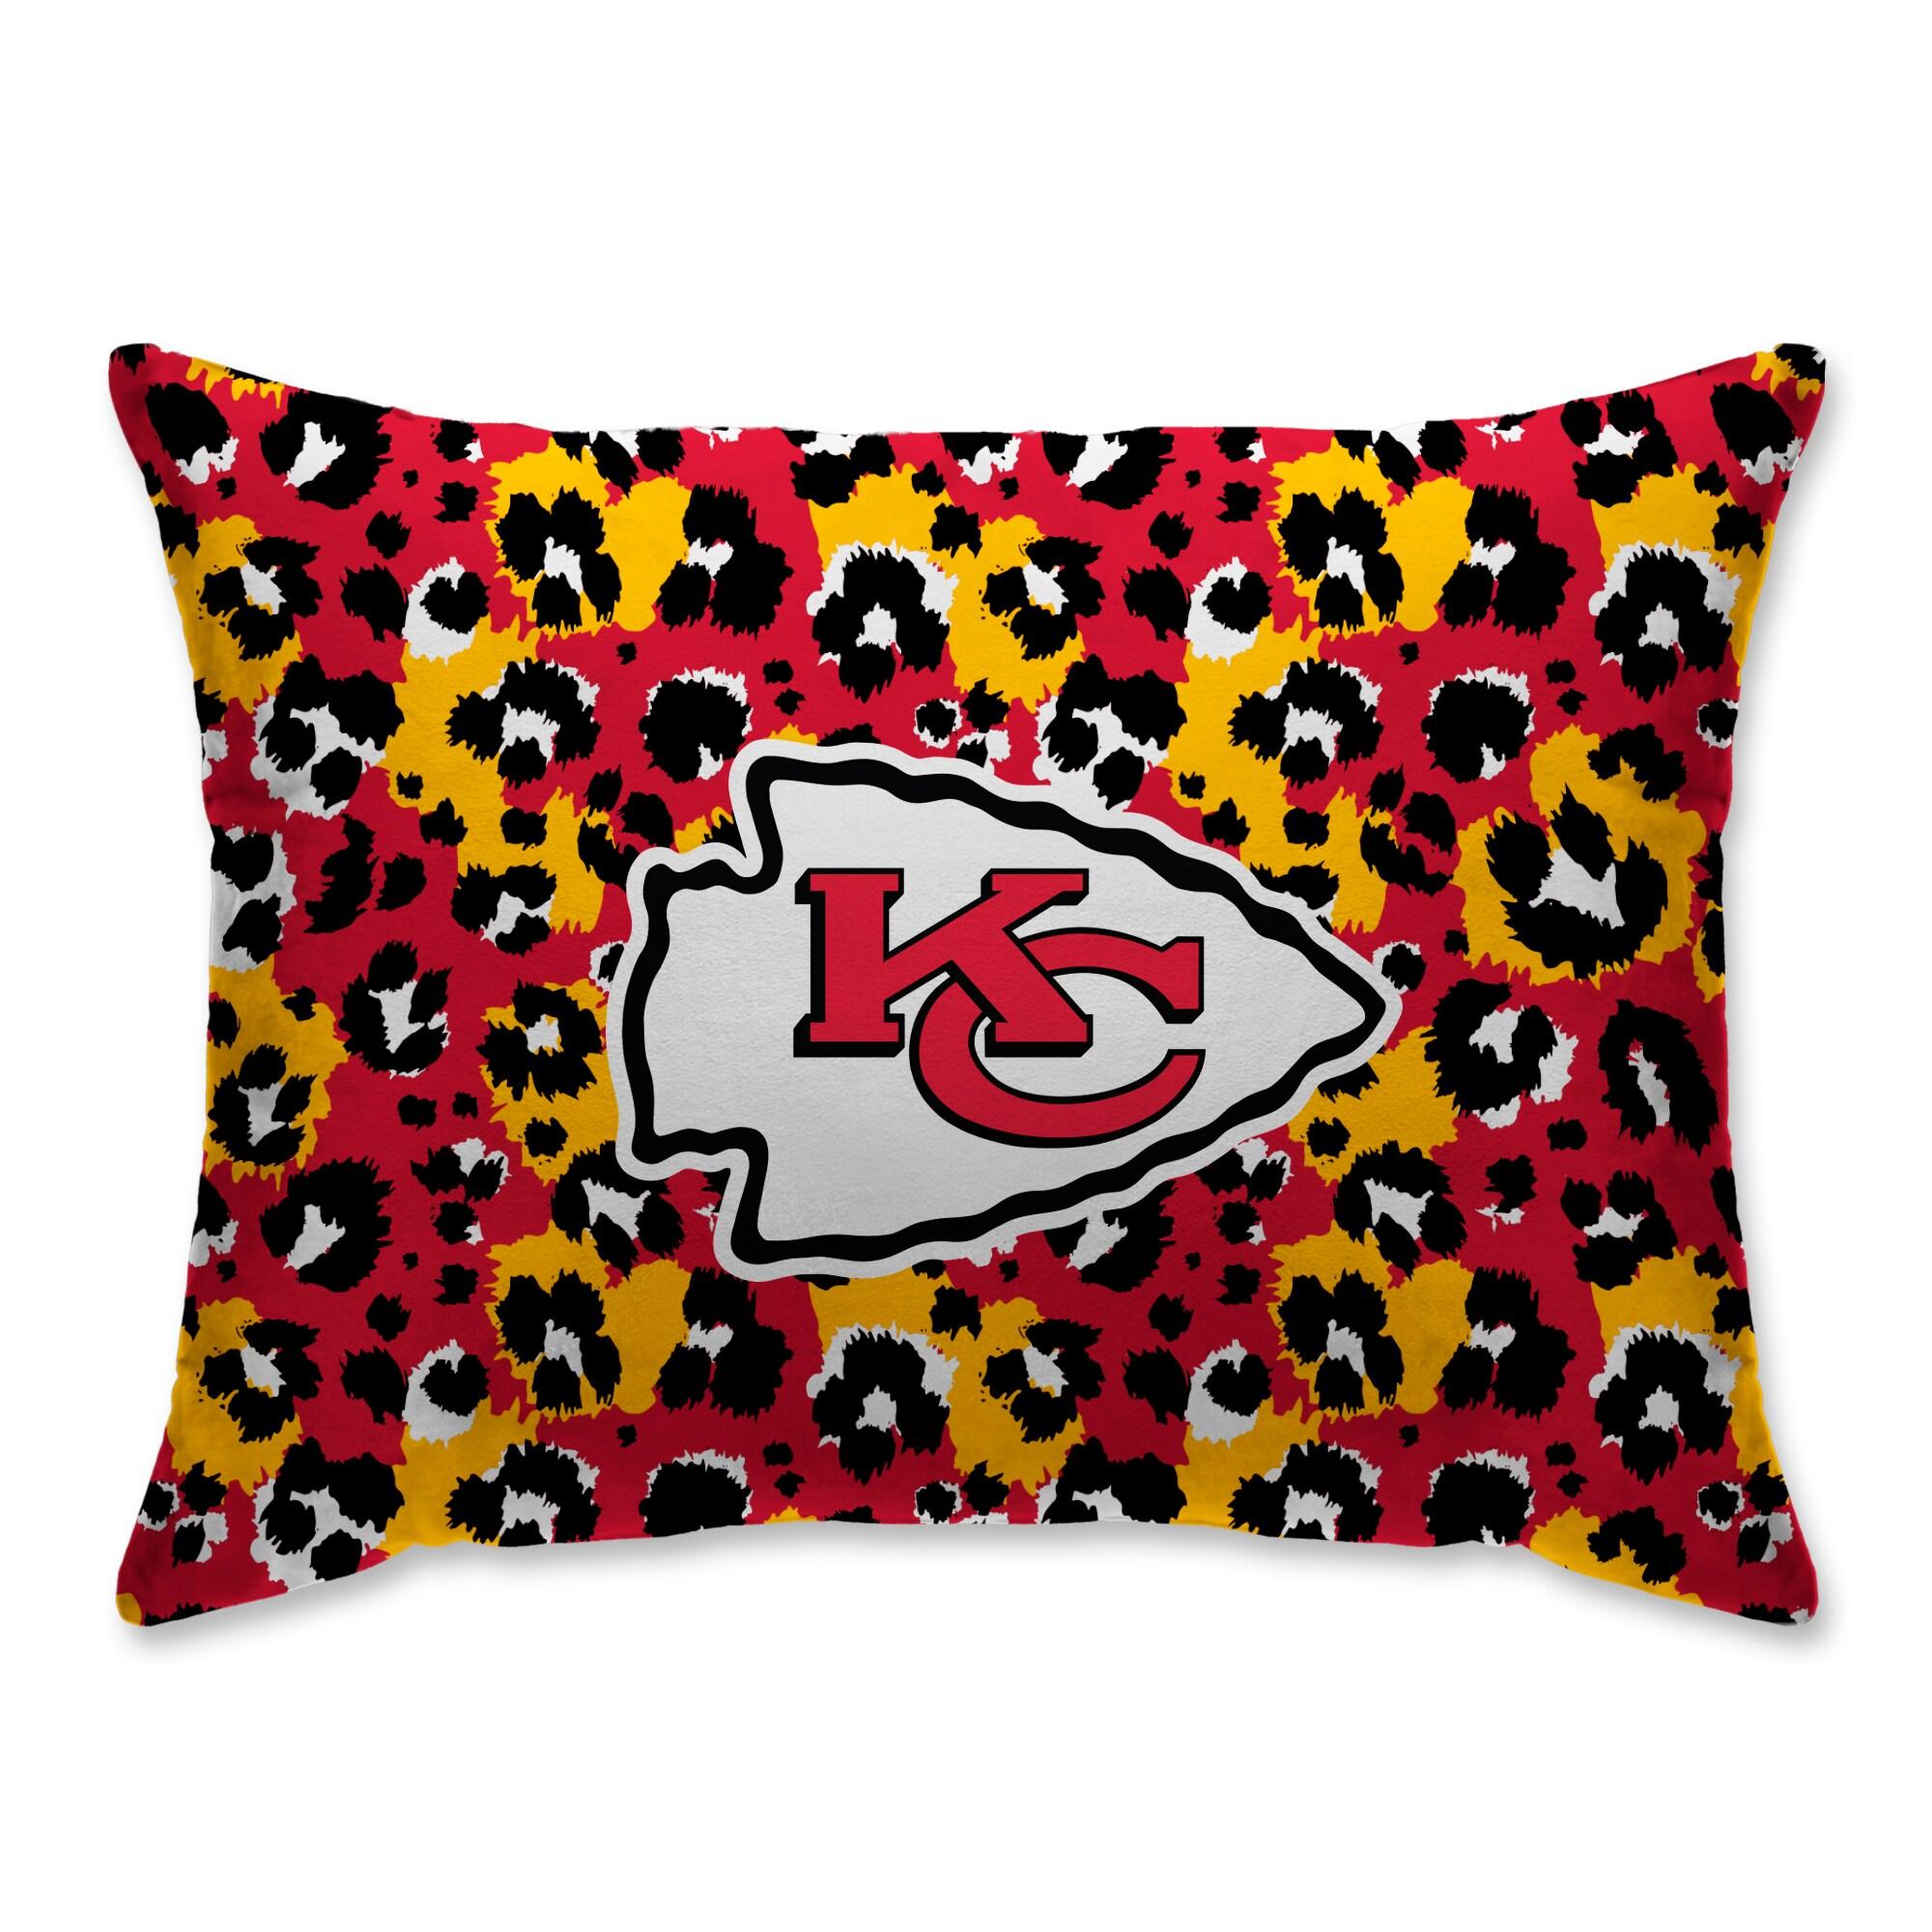 Kansas City Chiefs Leopard Plush Bed Pillow - Red